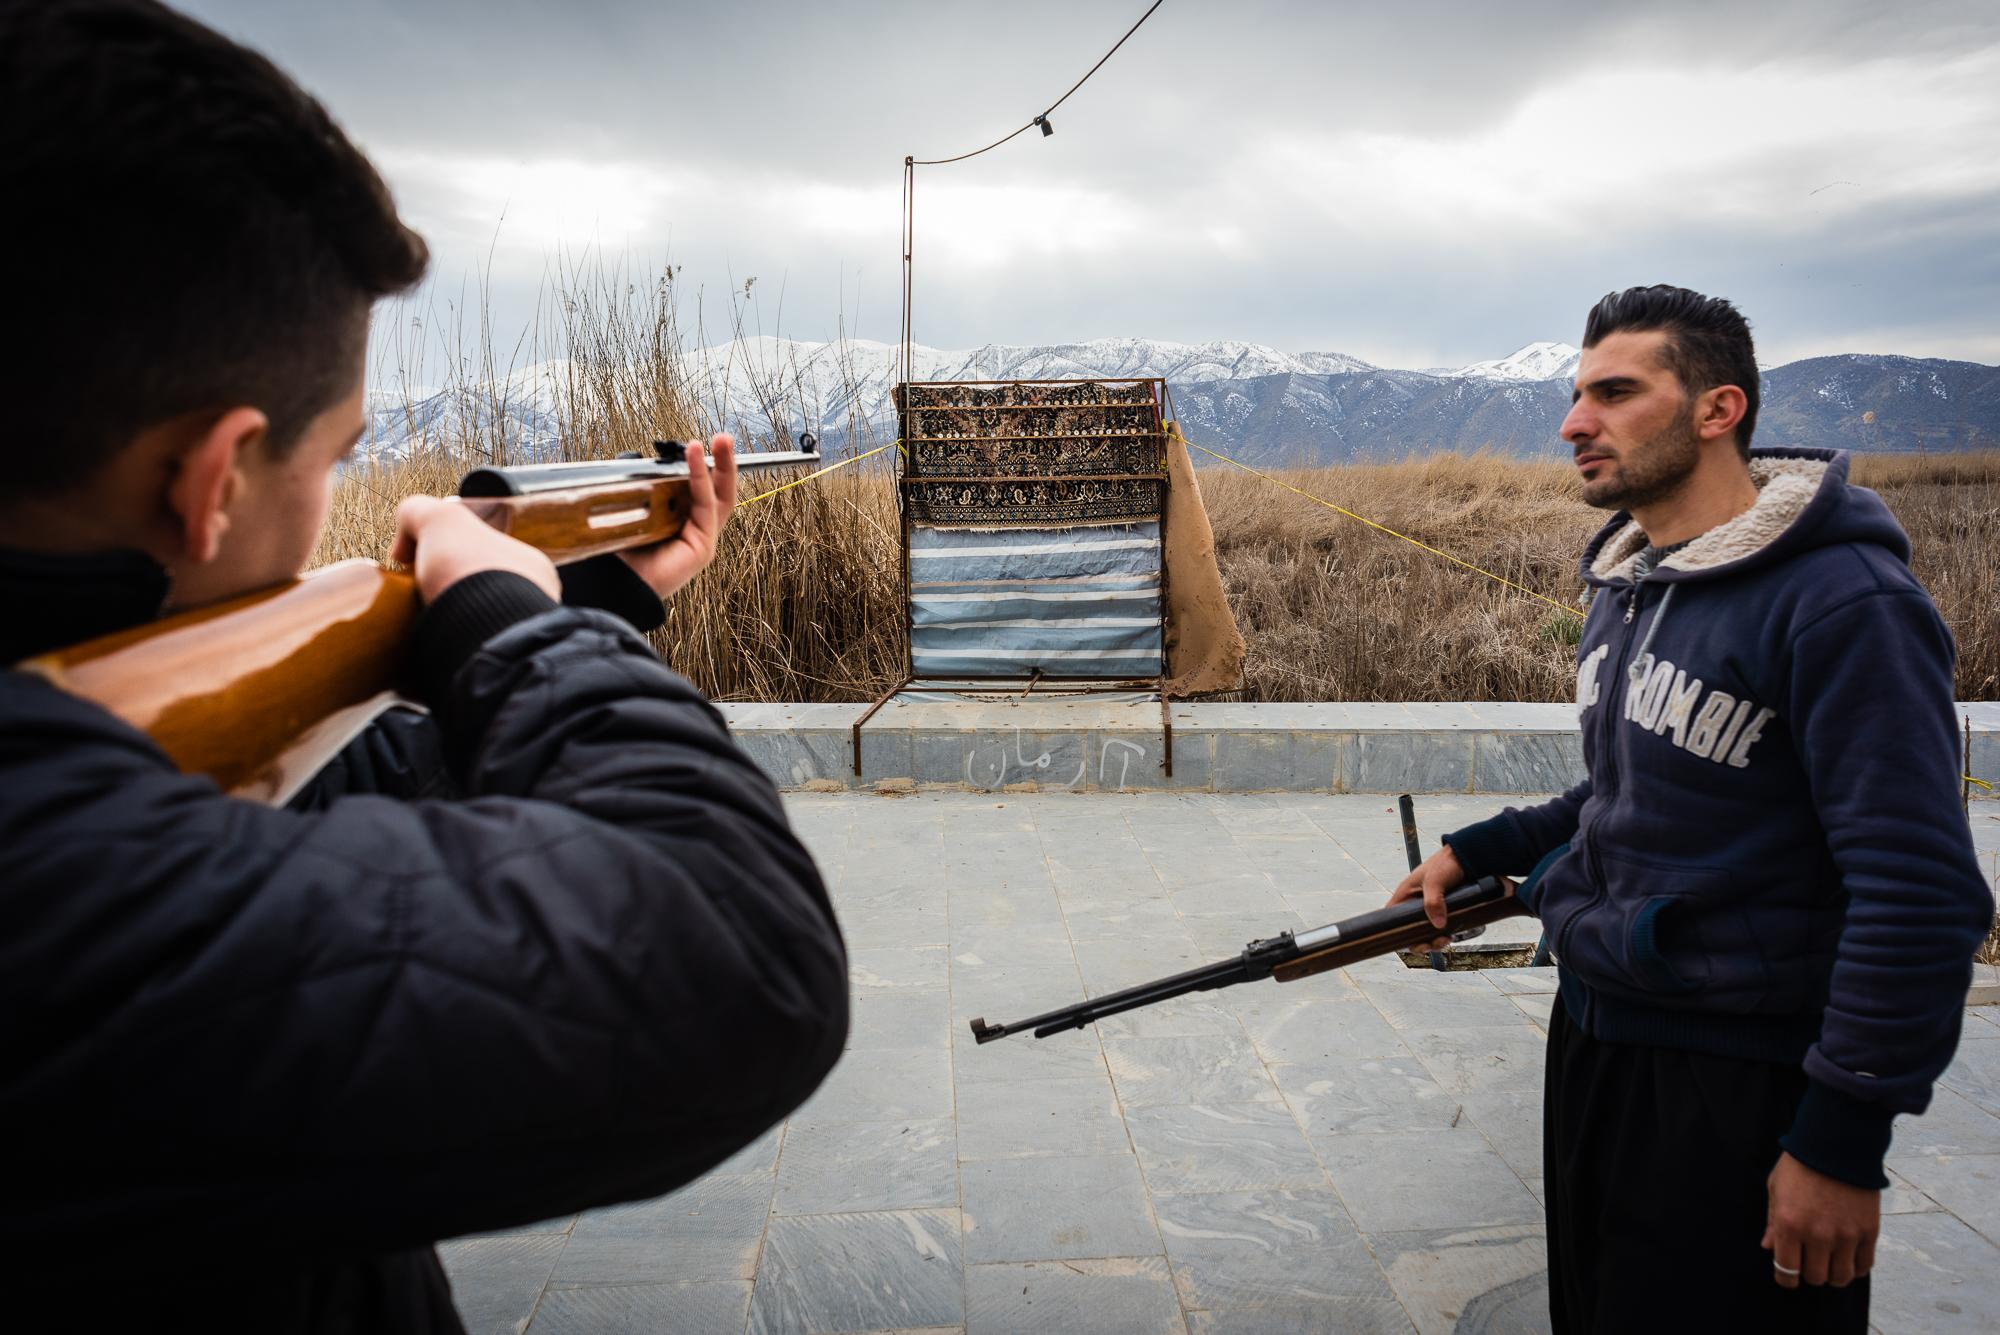 MARIVAN, IRAN – FEBRUARY 2, 2019: Young Kurds shooting air guns on the promenade along the Zrebar Lake.